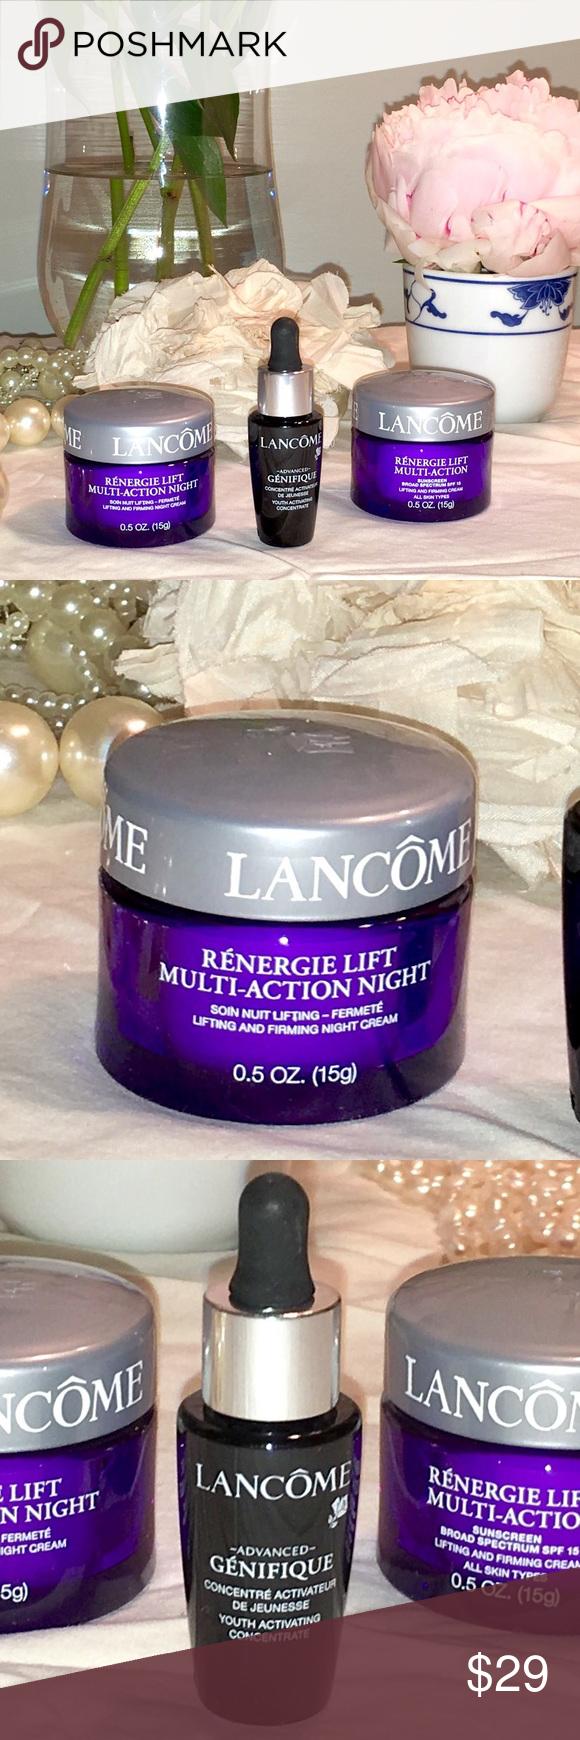 Lancôme Renergie & Genifique antiaging kit NWT Anti